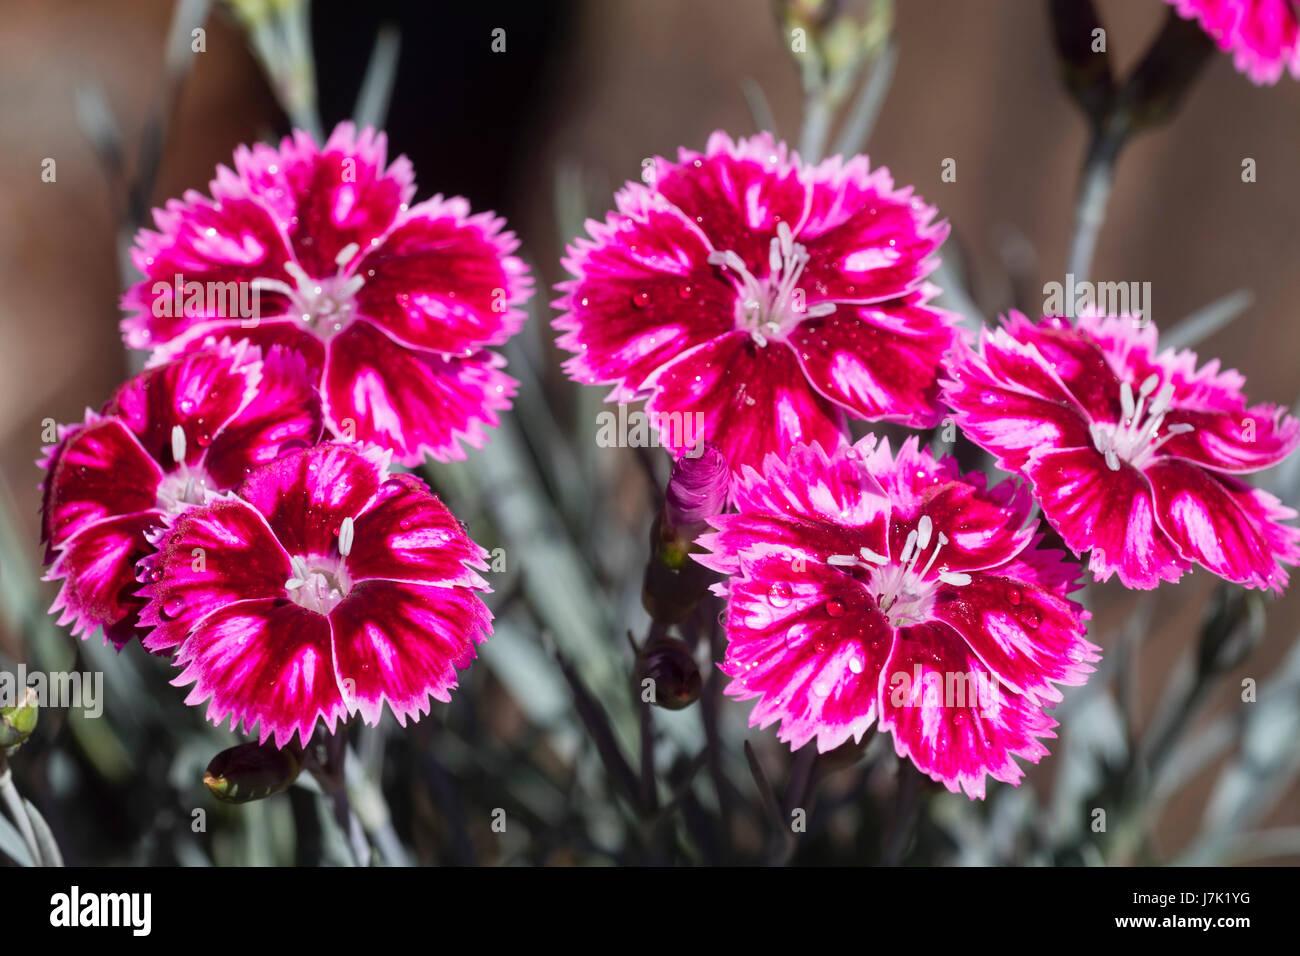 Pink Flowers White Edges Stock Photos Pink Flowers White Edges